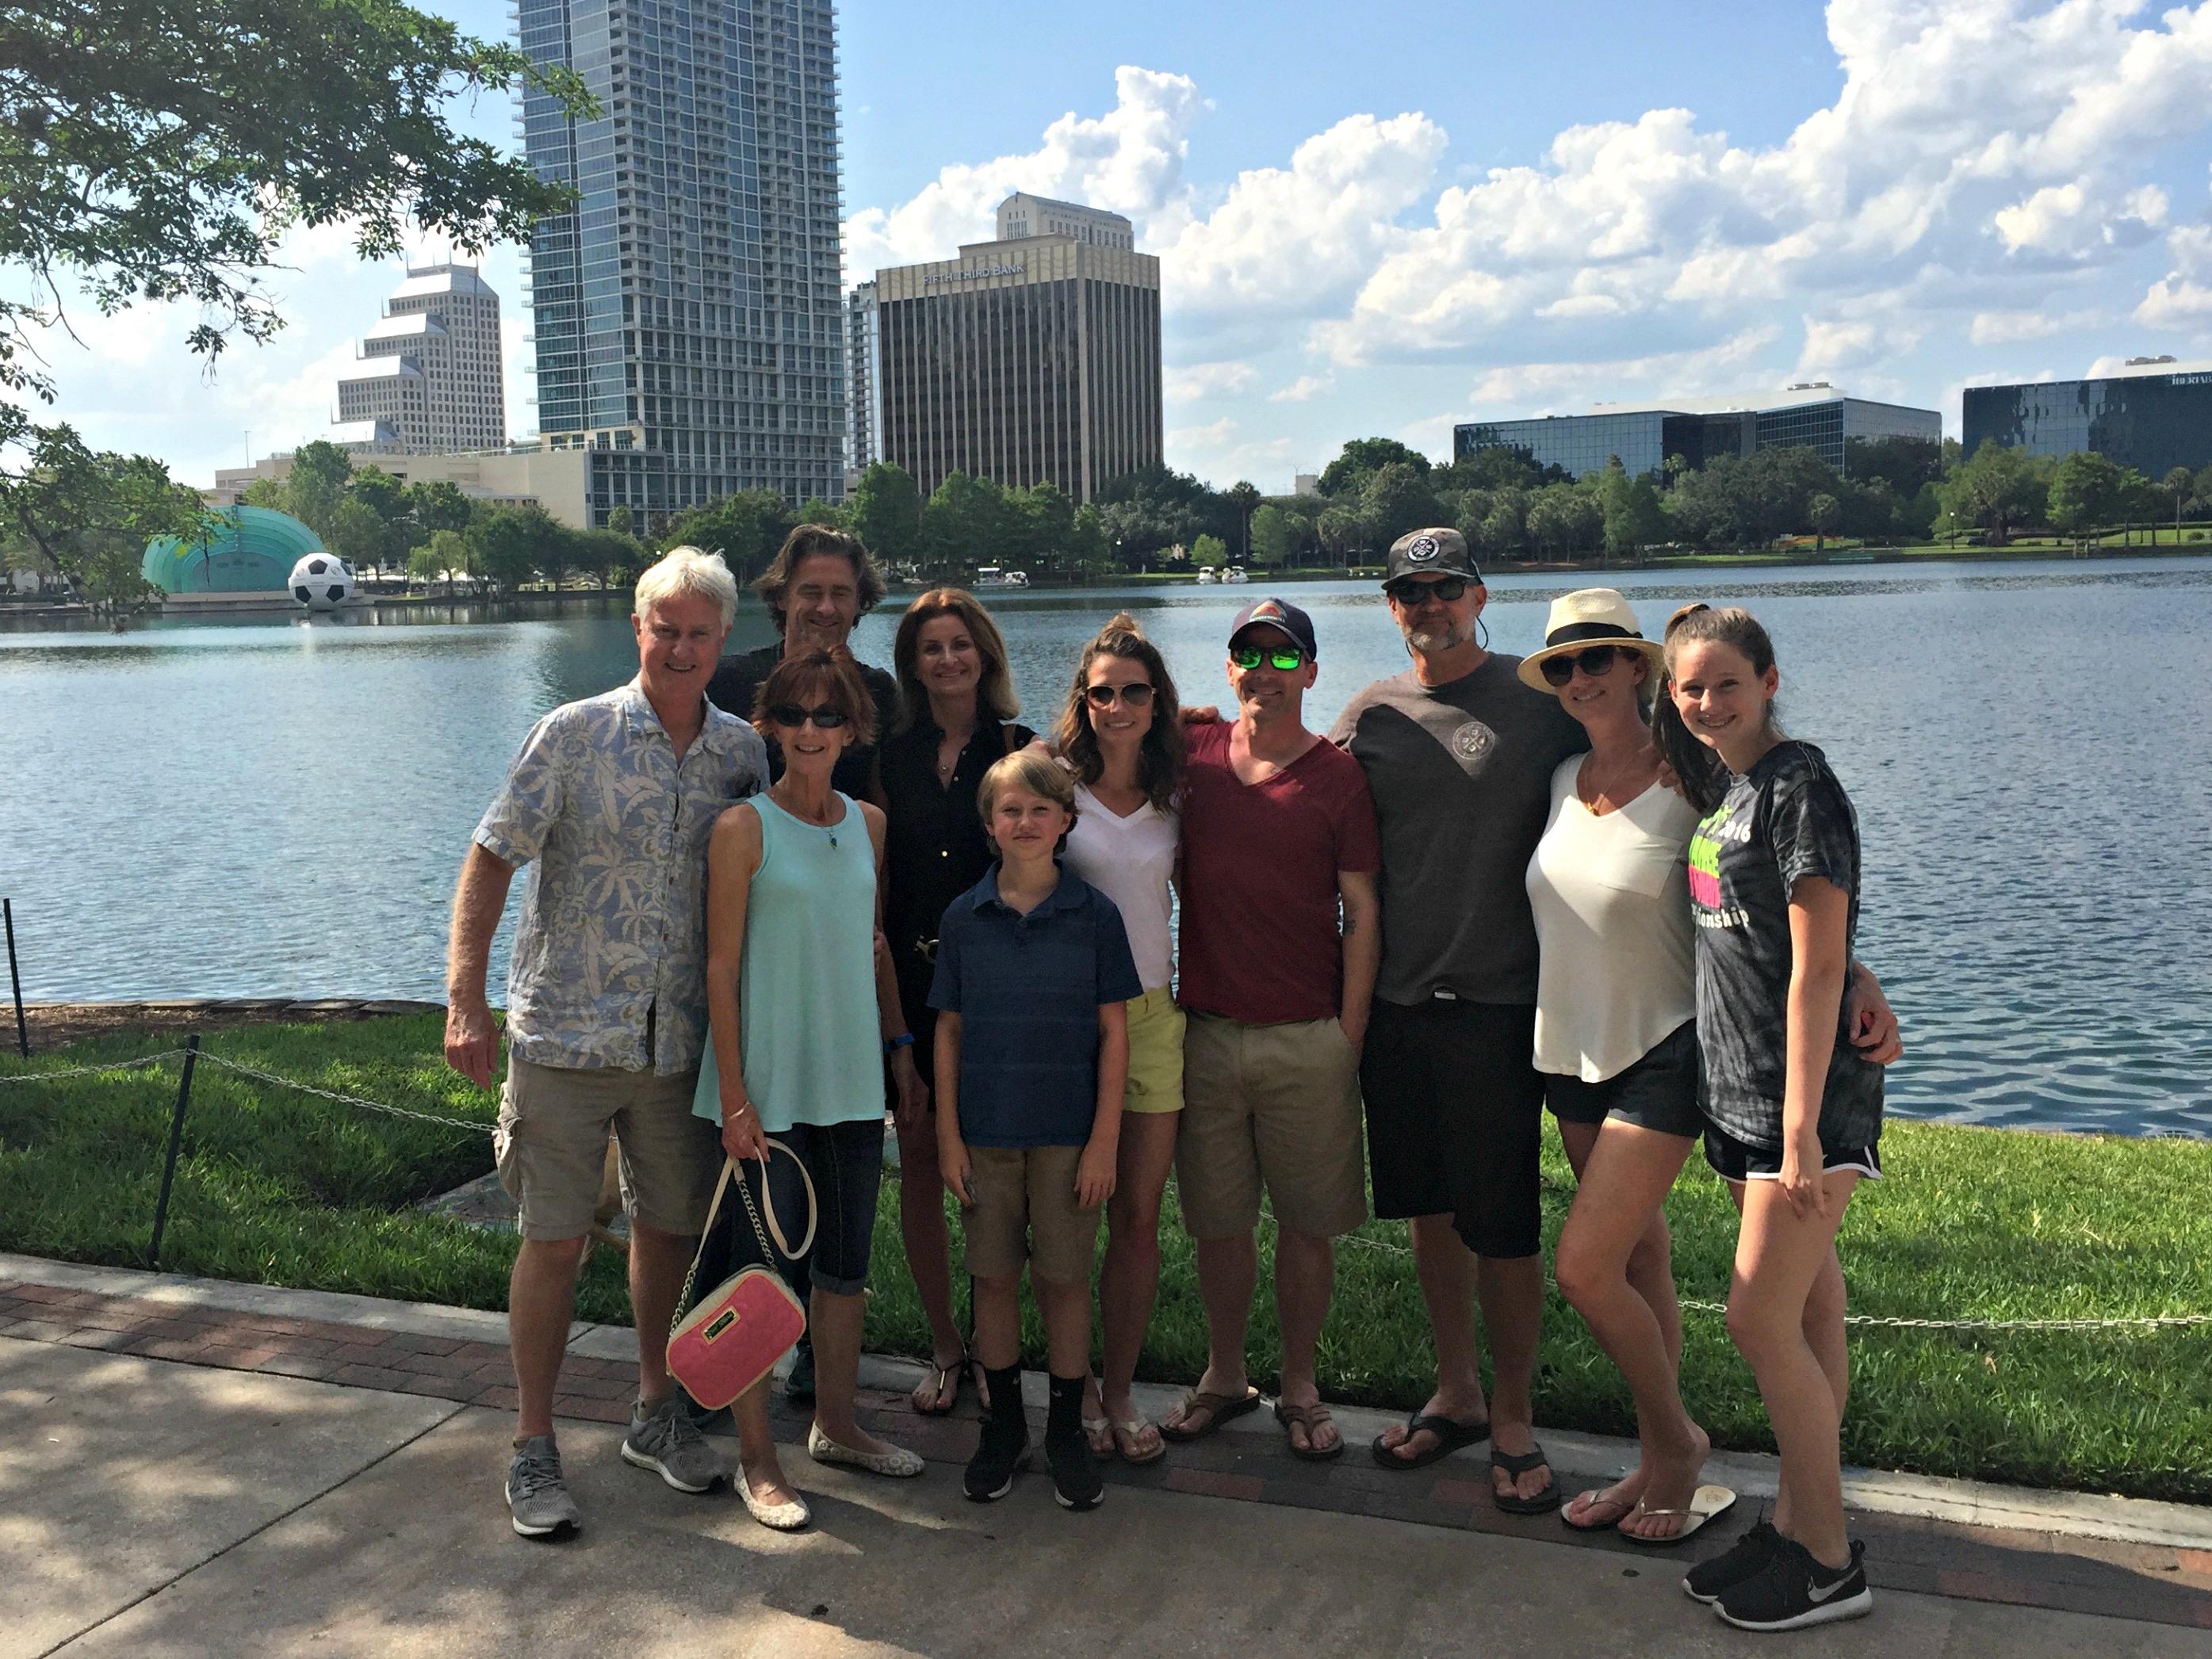 family photo at lake eola park